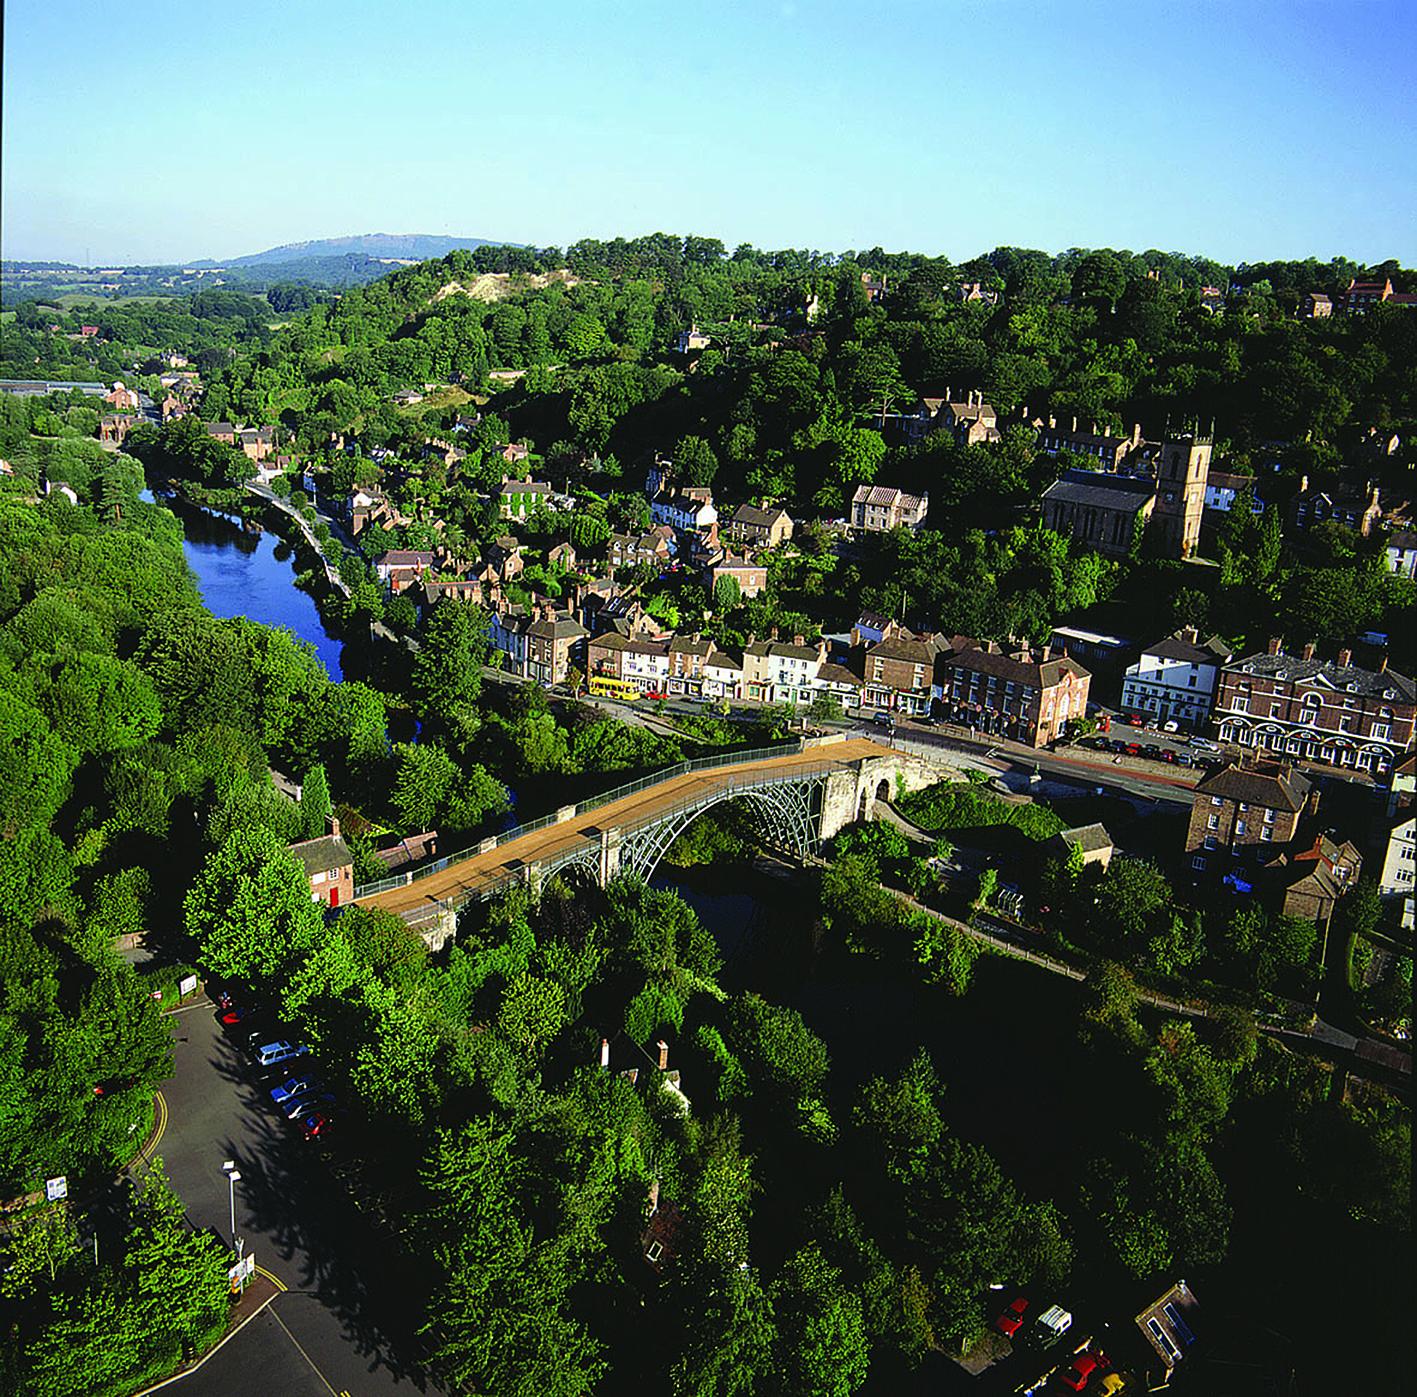 aerial-view-of-ironbridge-copy-1-copy.jpg